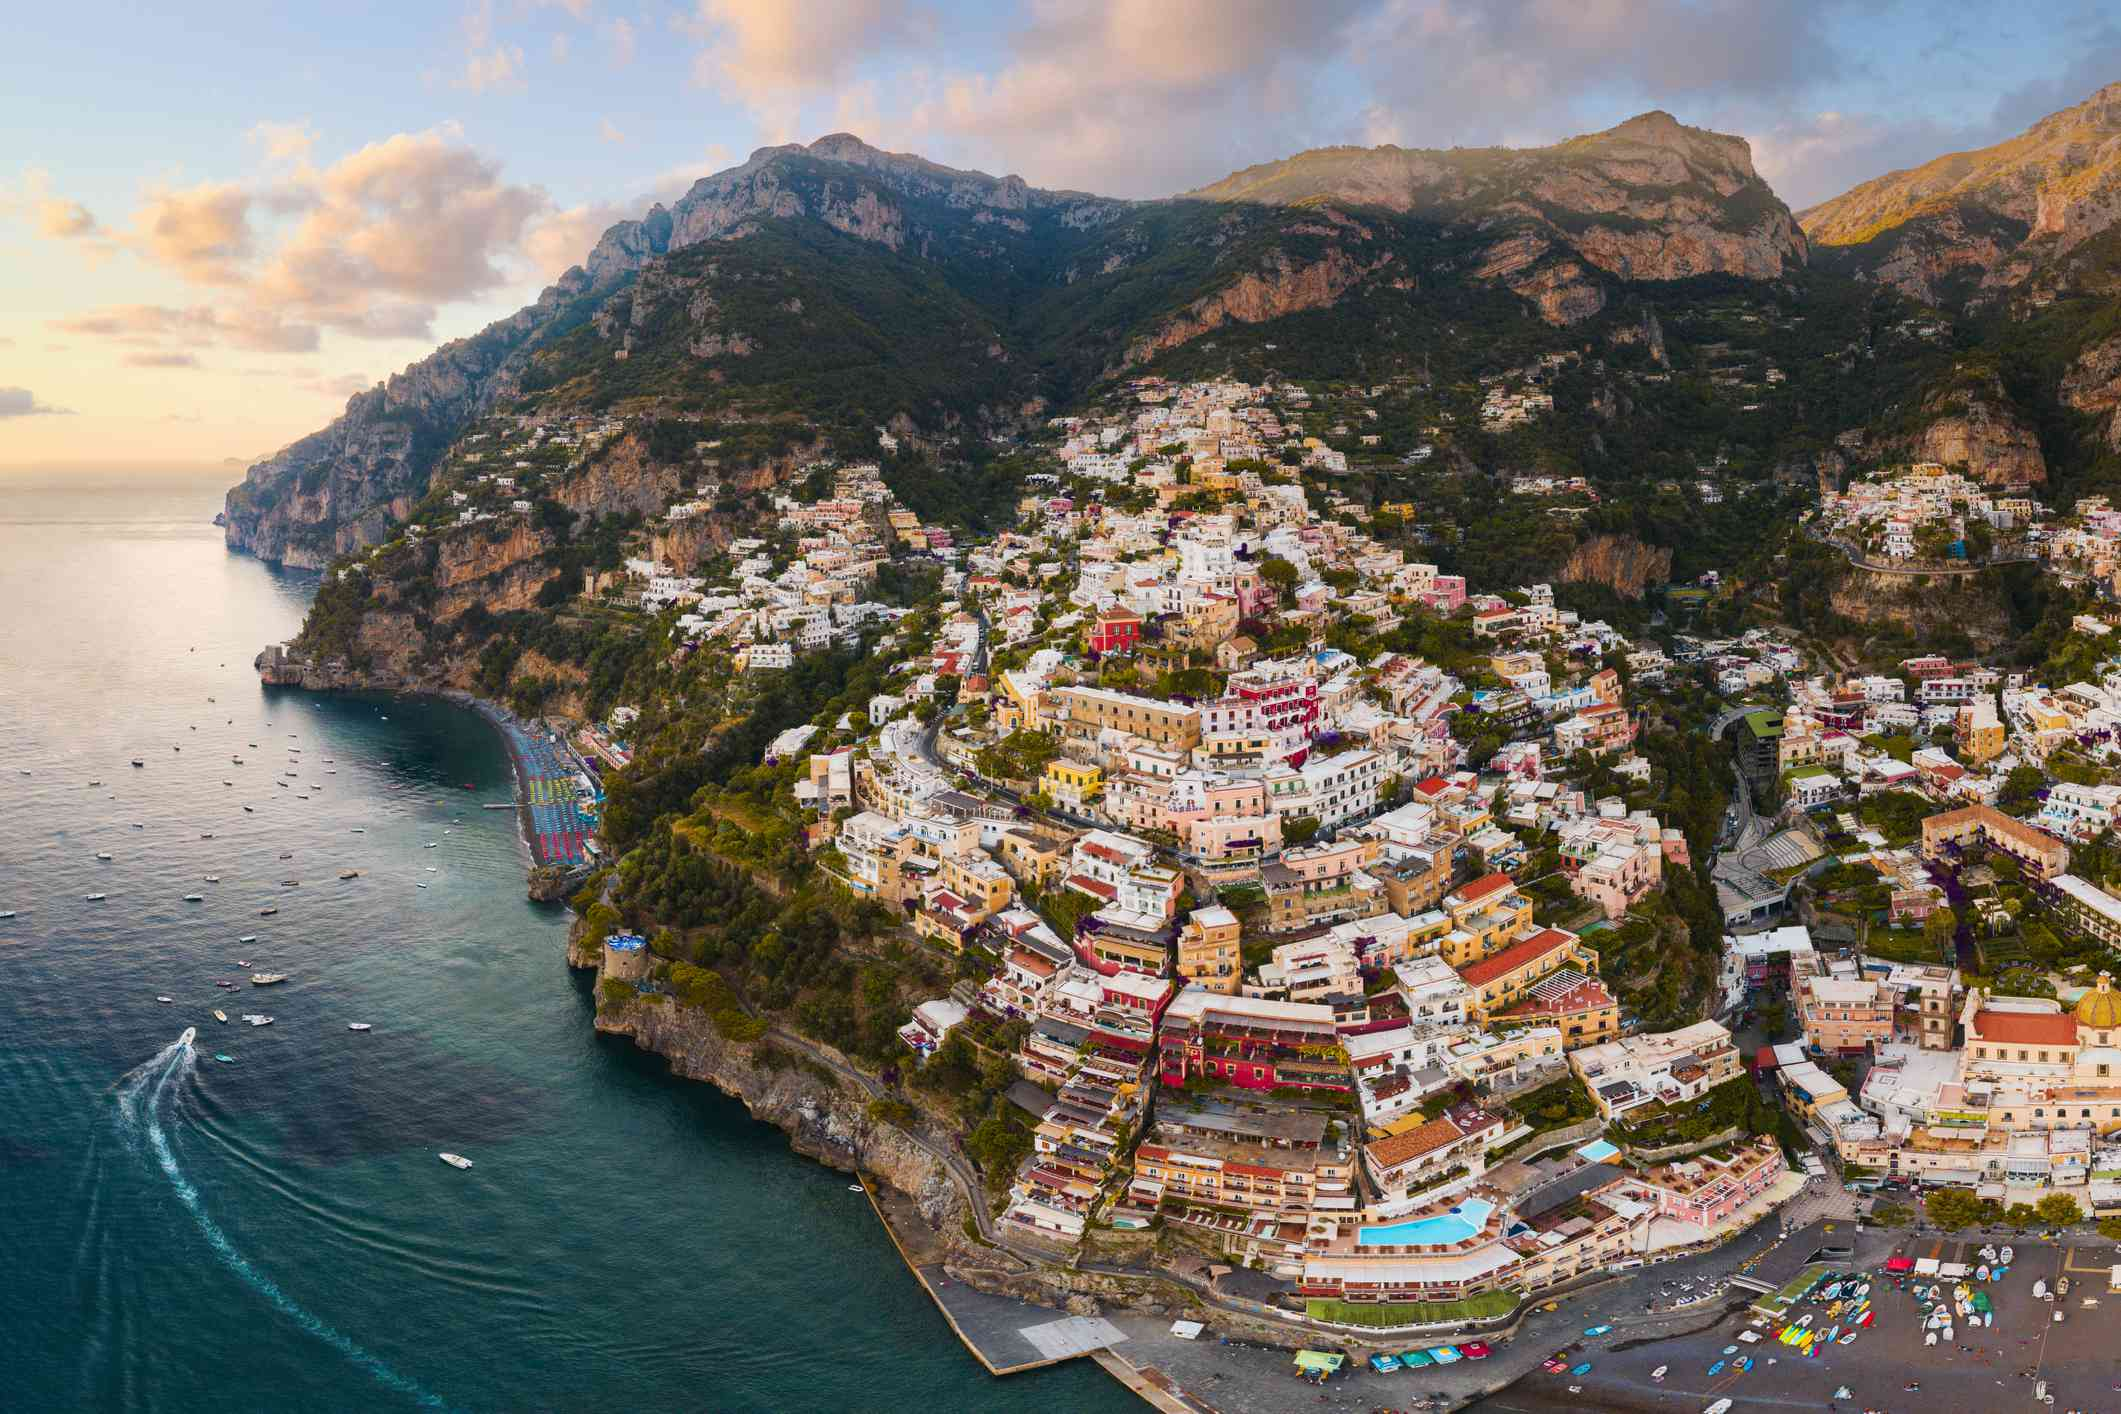 Positano, Amalfi Coast, Italy. Aerial view.